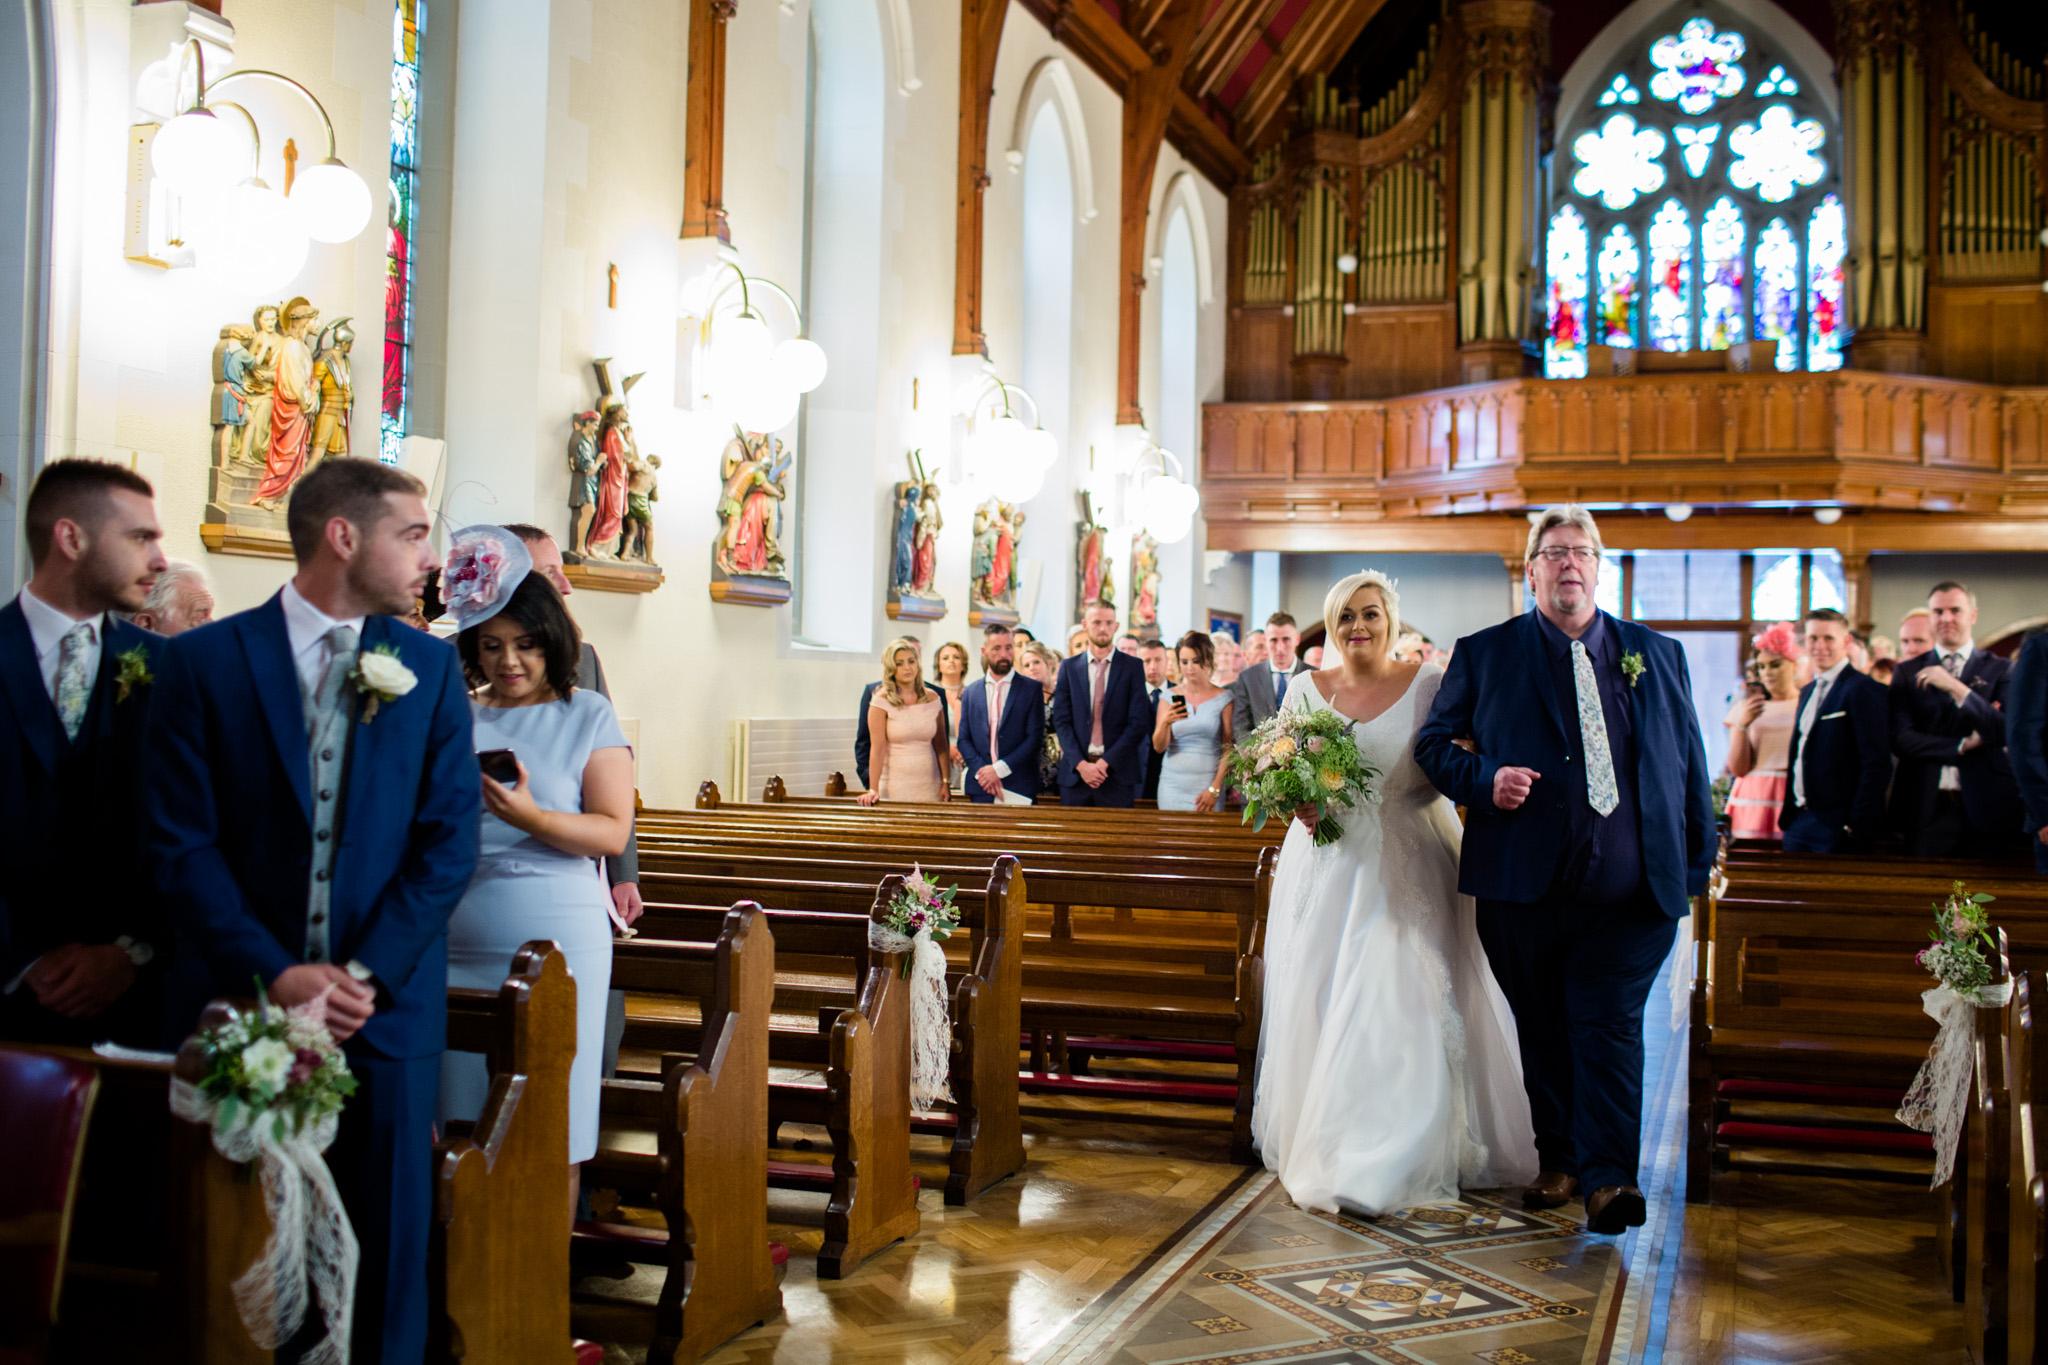 Northern-Ireland-Wedding-Photographer-Mark-Barnes-Ballymena_wedding-photography-Leighinmohr-House-Seamas_Alanna_For-web-18.jpg